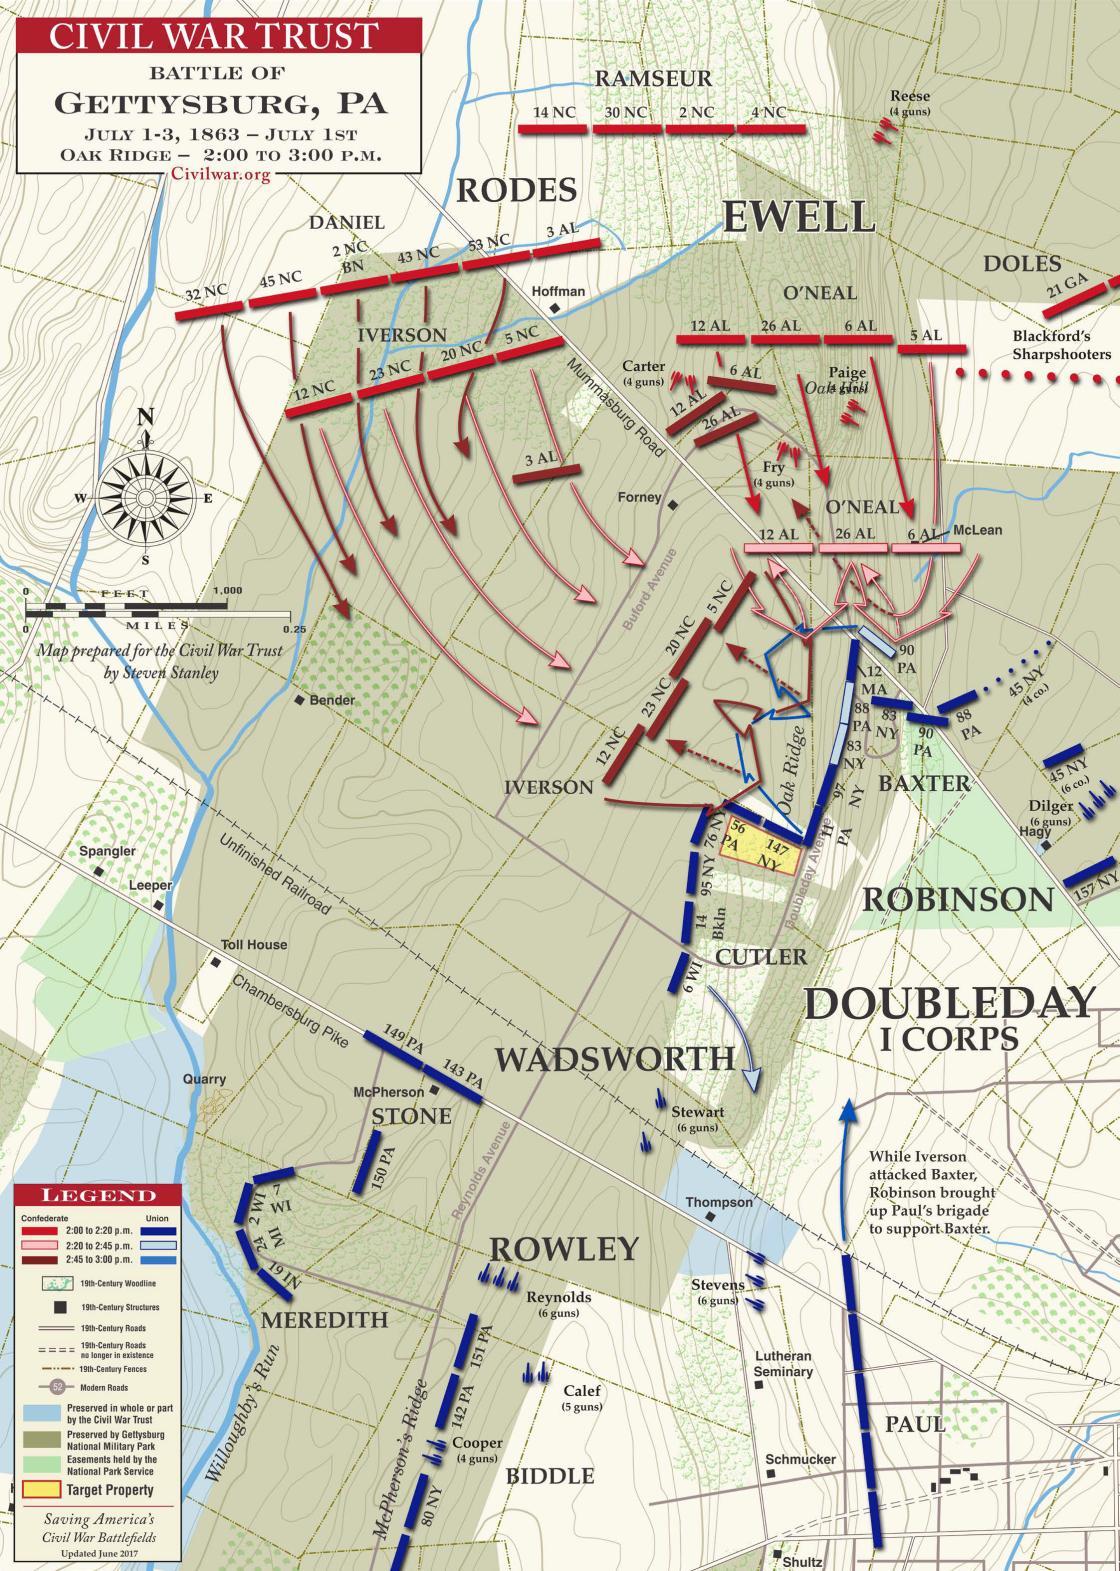 Gettysburg: Oak Ridge, July 1, 1863, 2:00-3:00pm